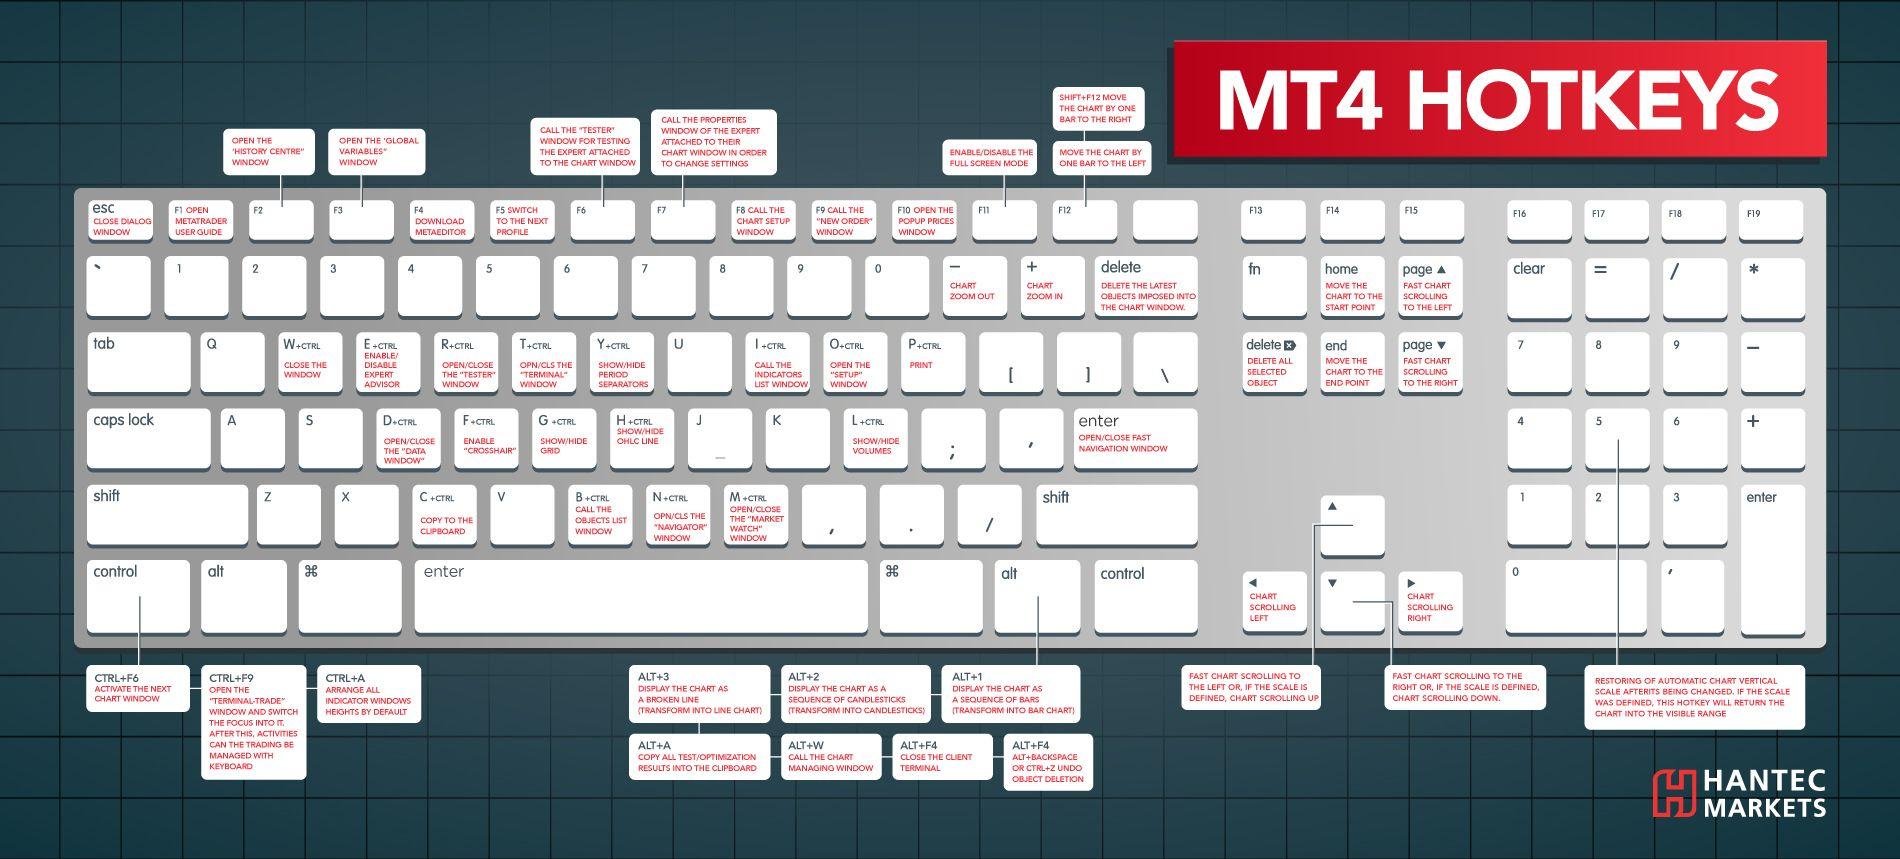 MT4 HOTKEYS Infographic Infographic, Technical analysis